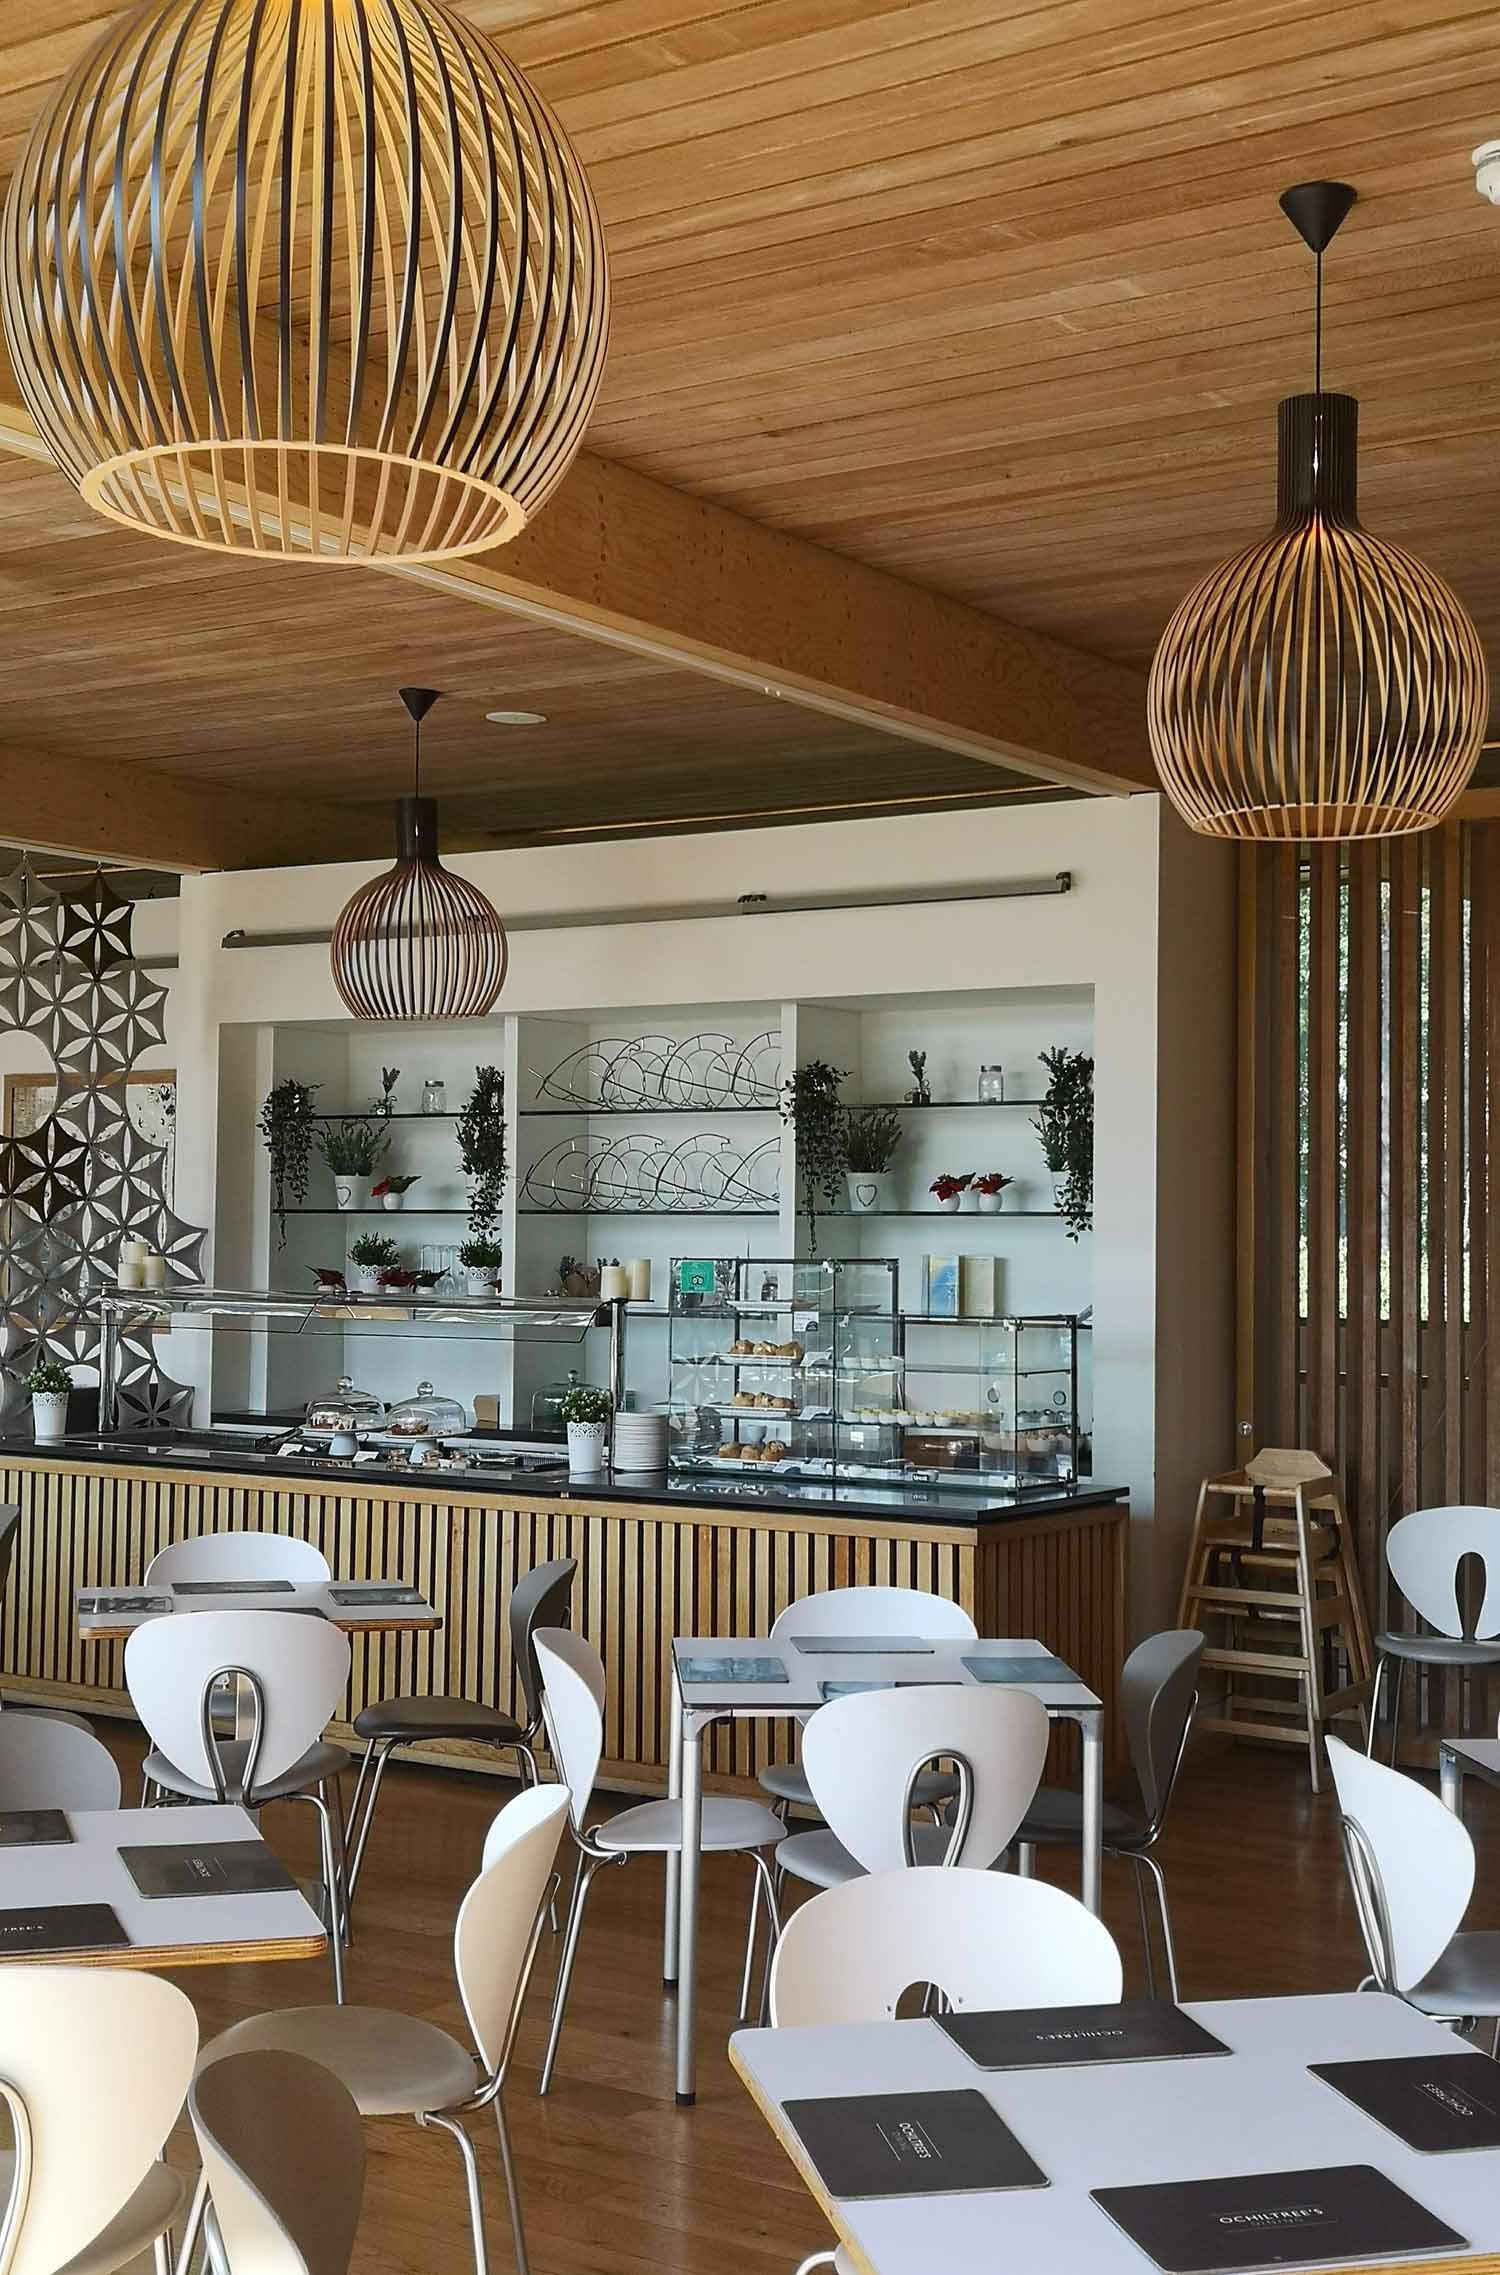 Abbotsford cafe 2.jpg